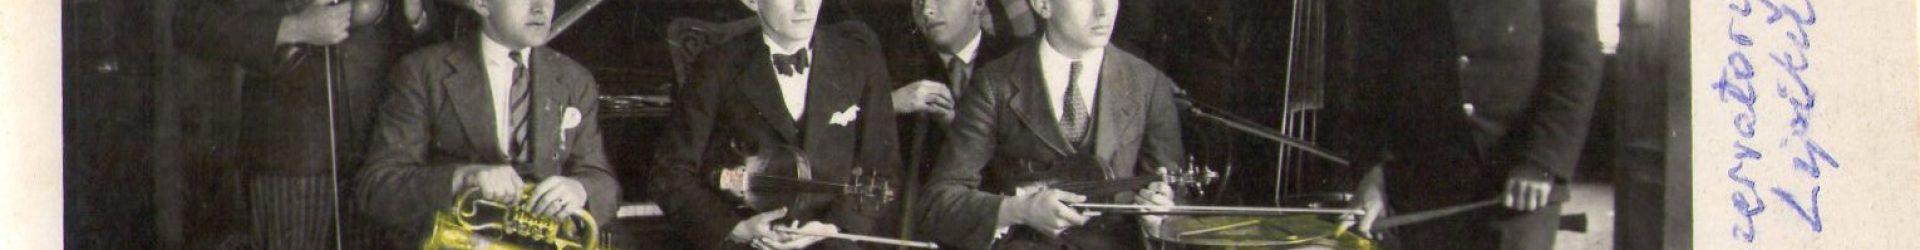 Orkestar Učiteljske škole Pakrac s voditeljicom Adelom Kamenar, 1930.